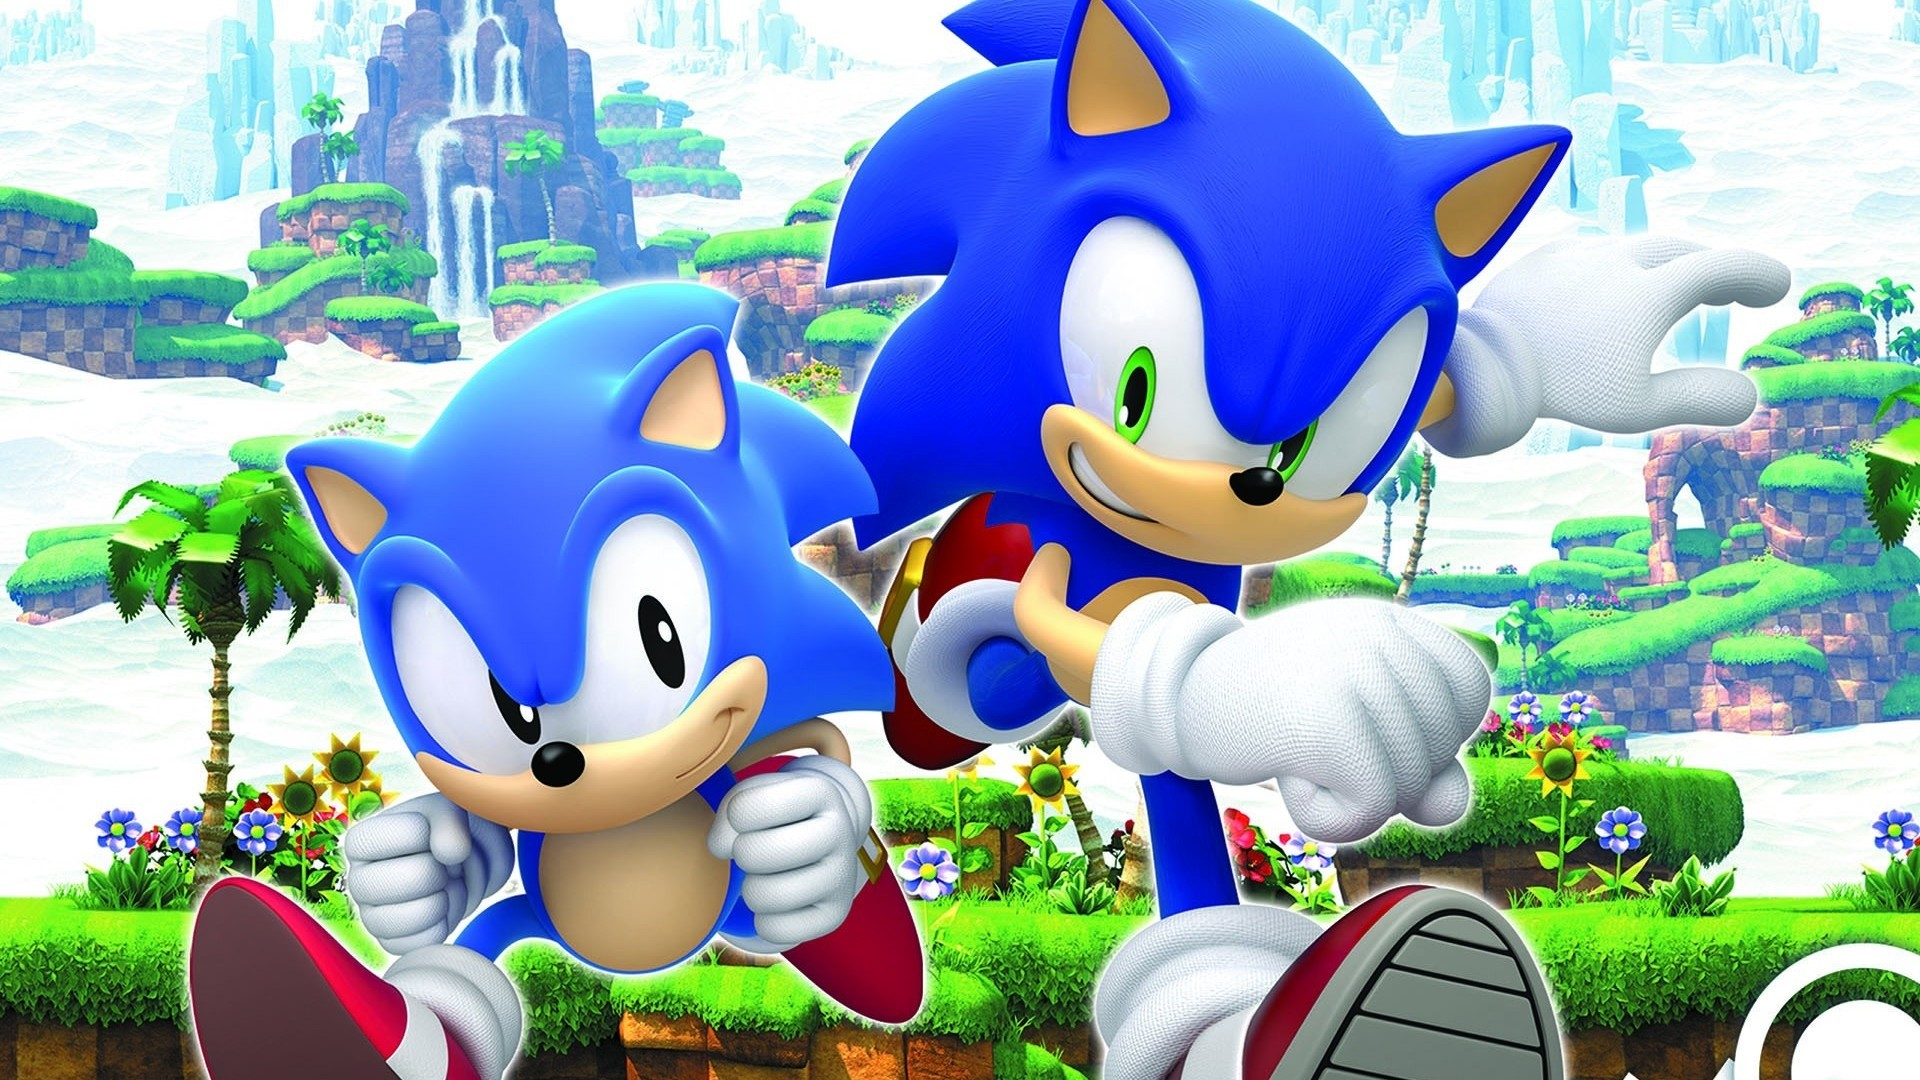 Sonic hd wallpaper download